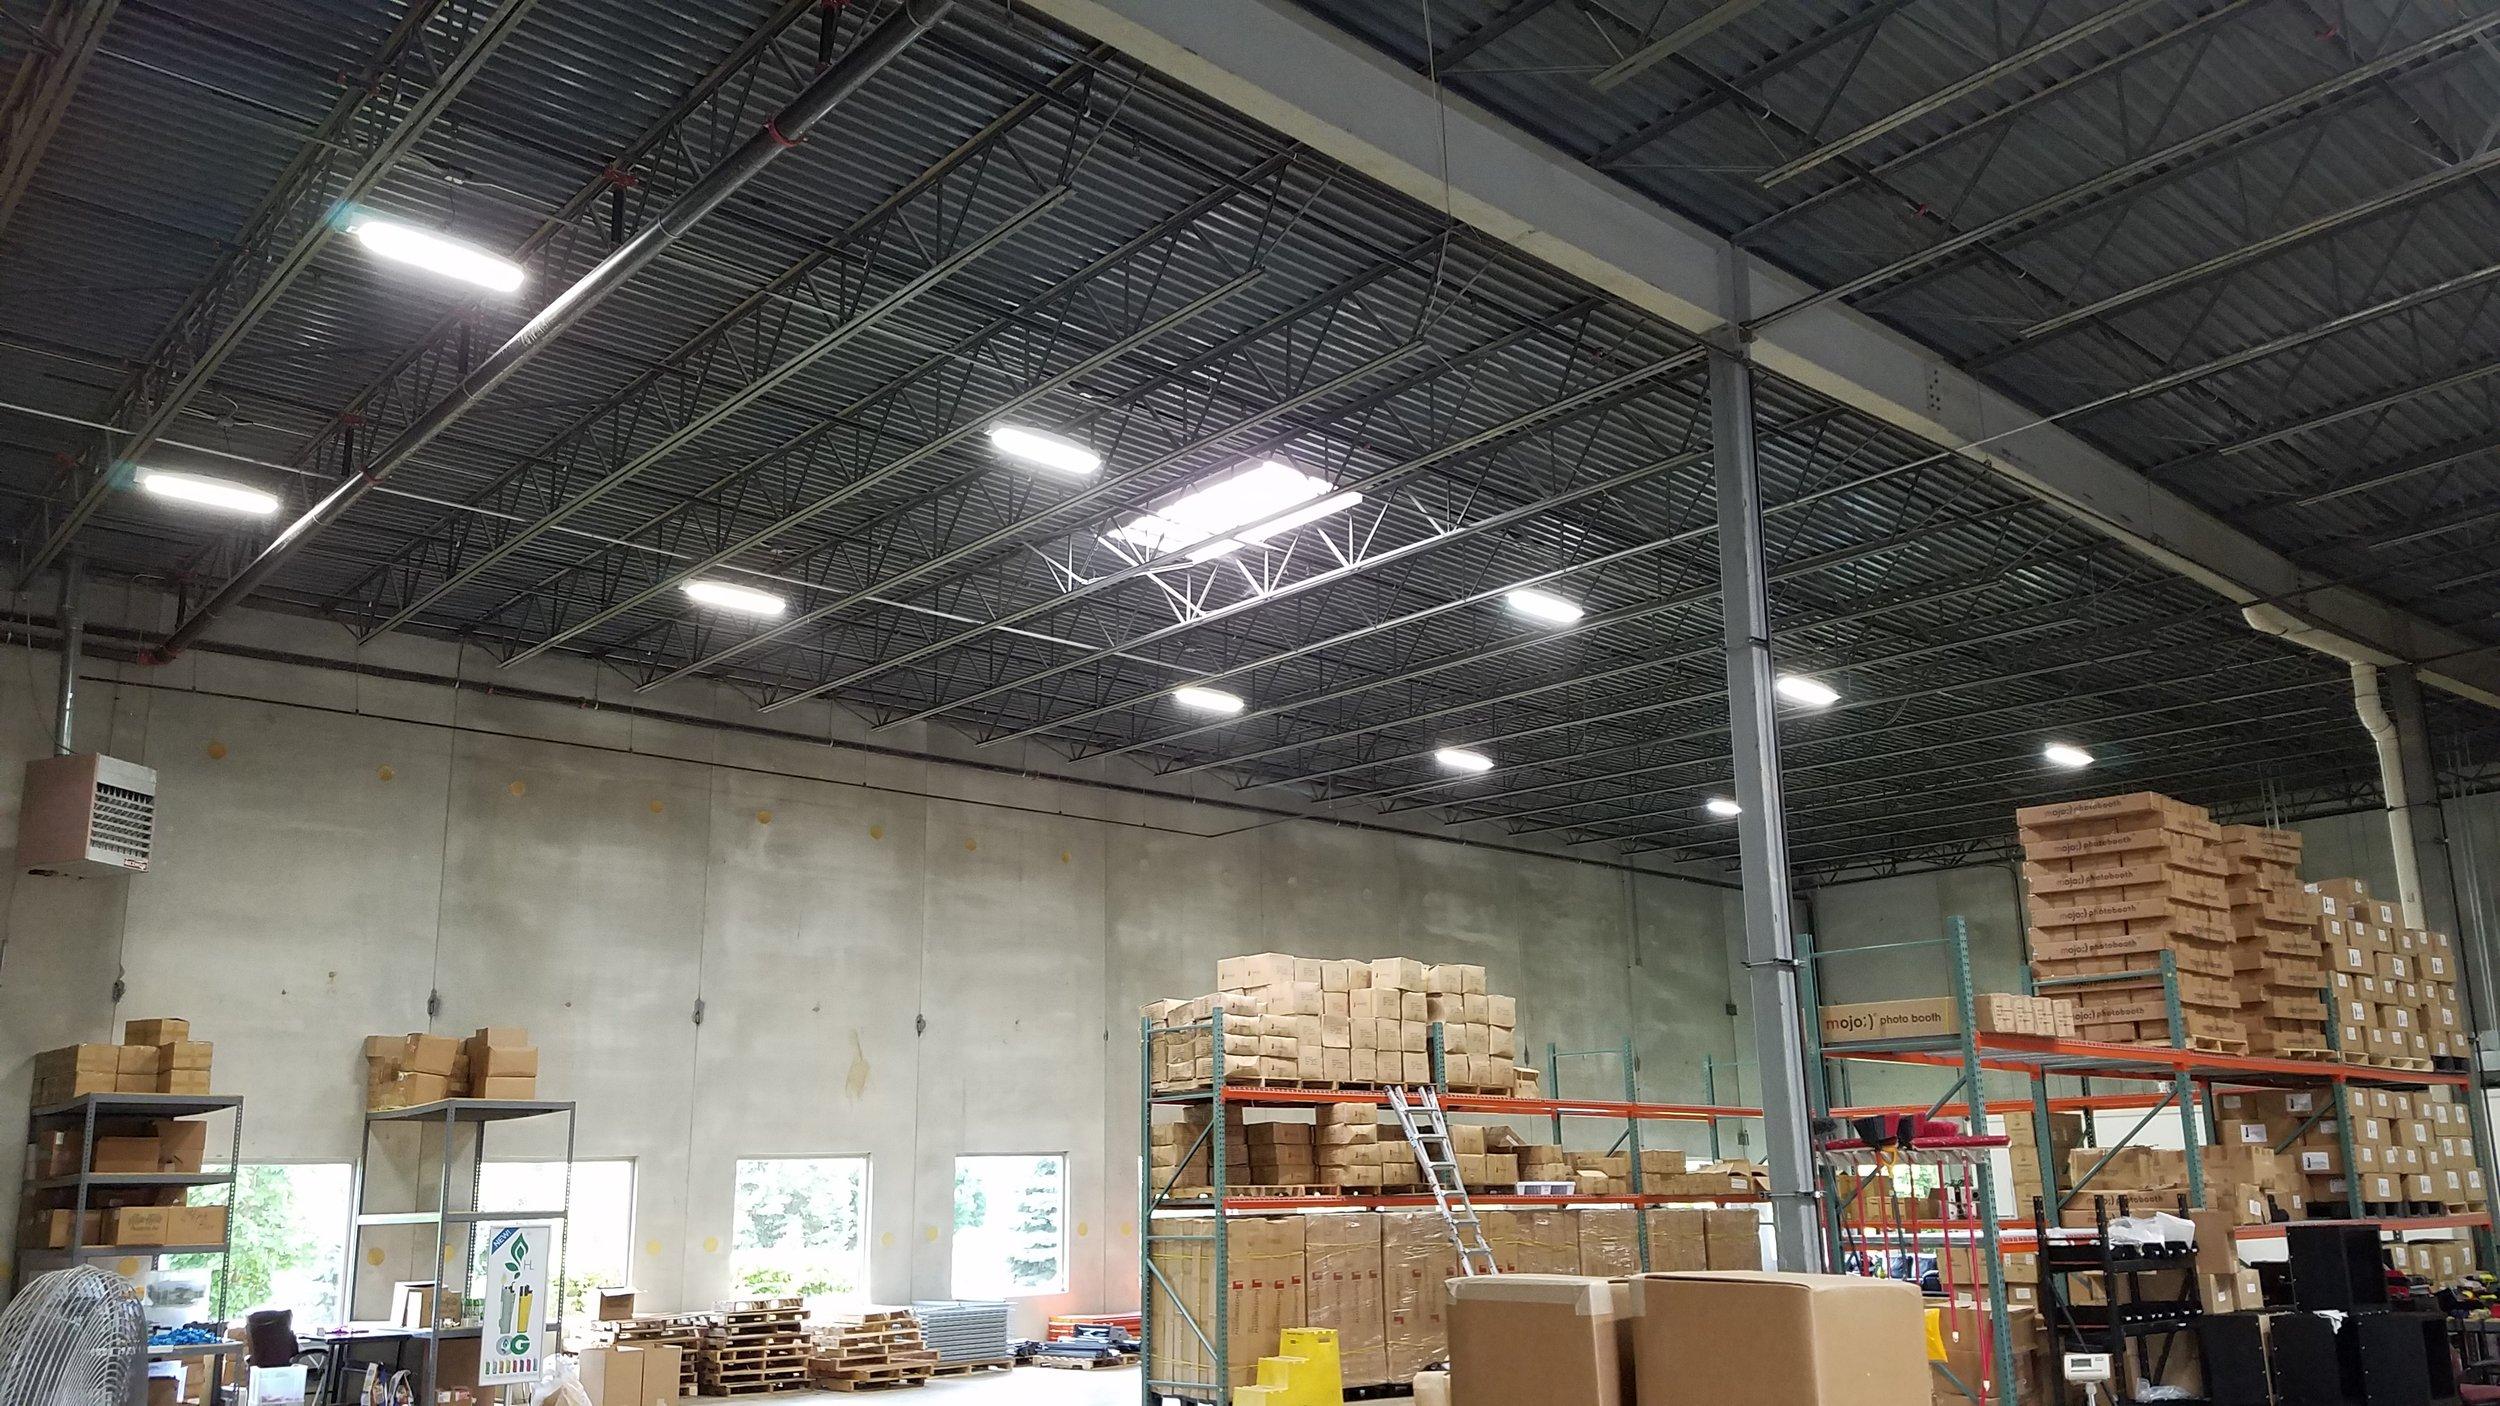 Delviro LED HiBay w/ occupancy sensor controls